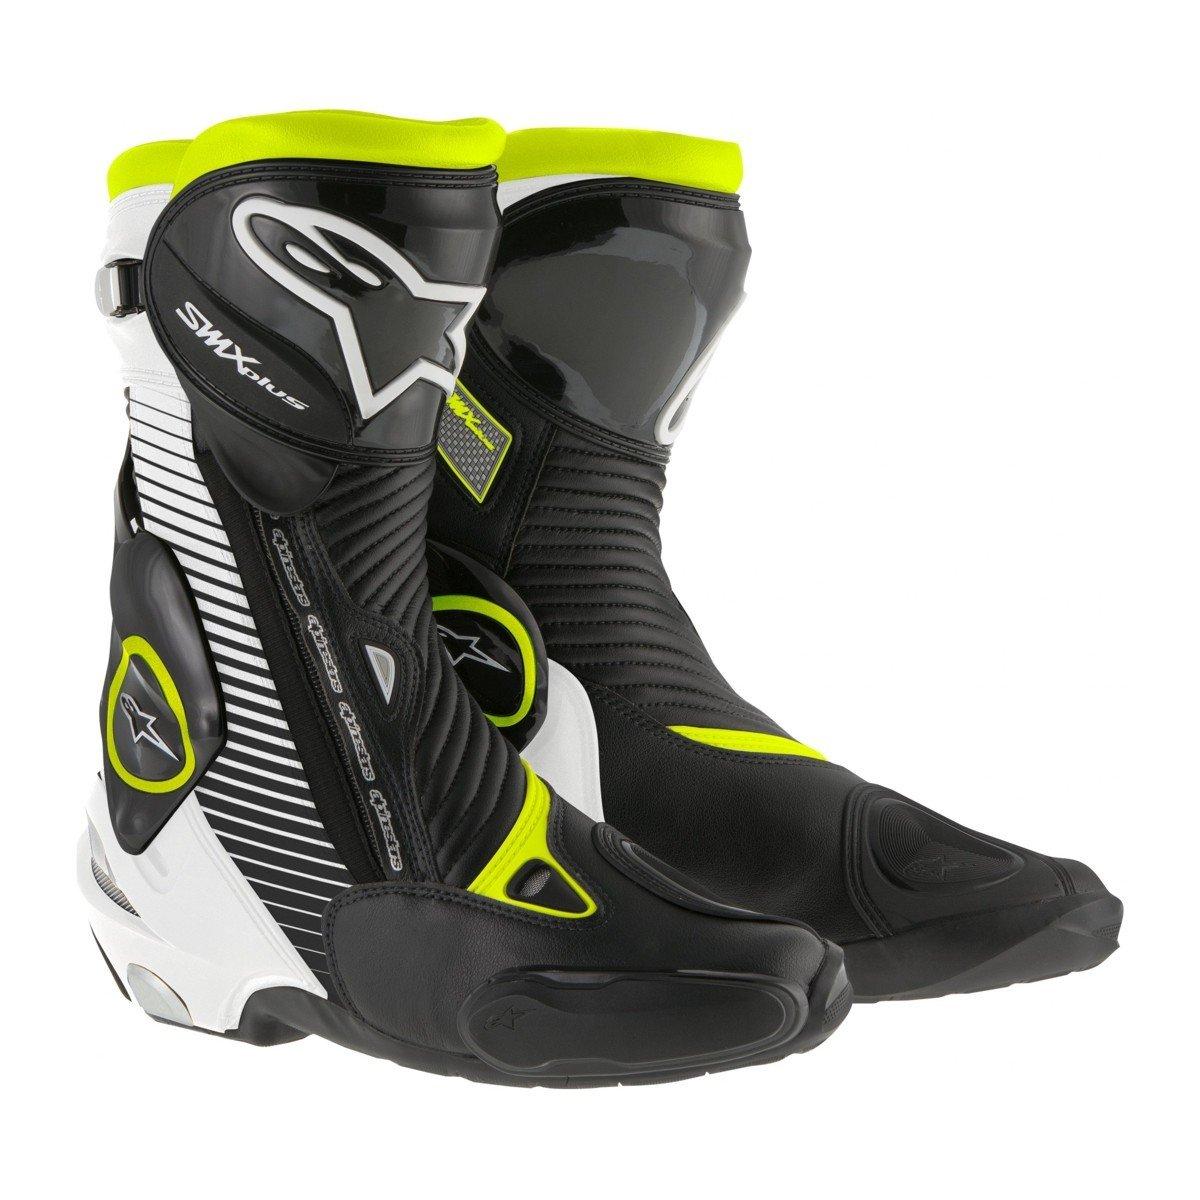 Alpinestars S-MX PLUS Black/White/Fluo Yellow 36